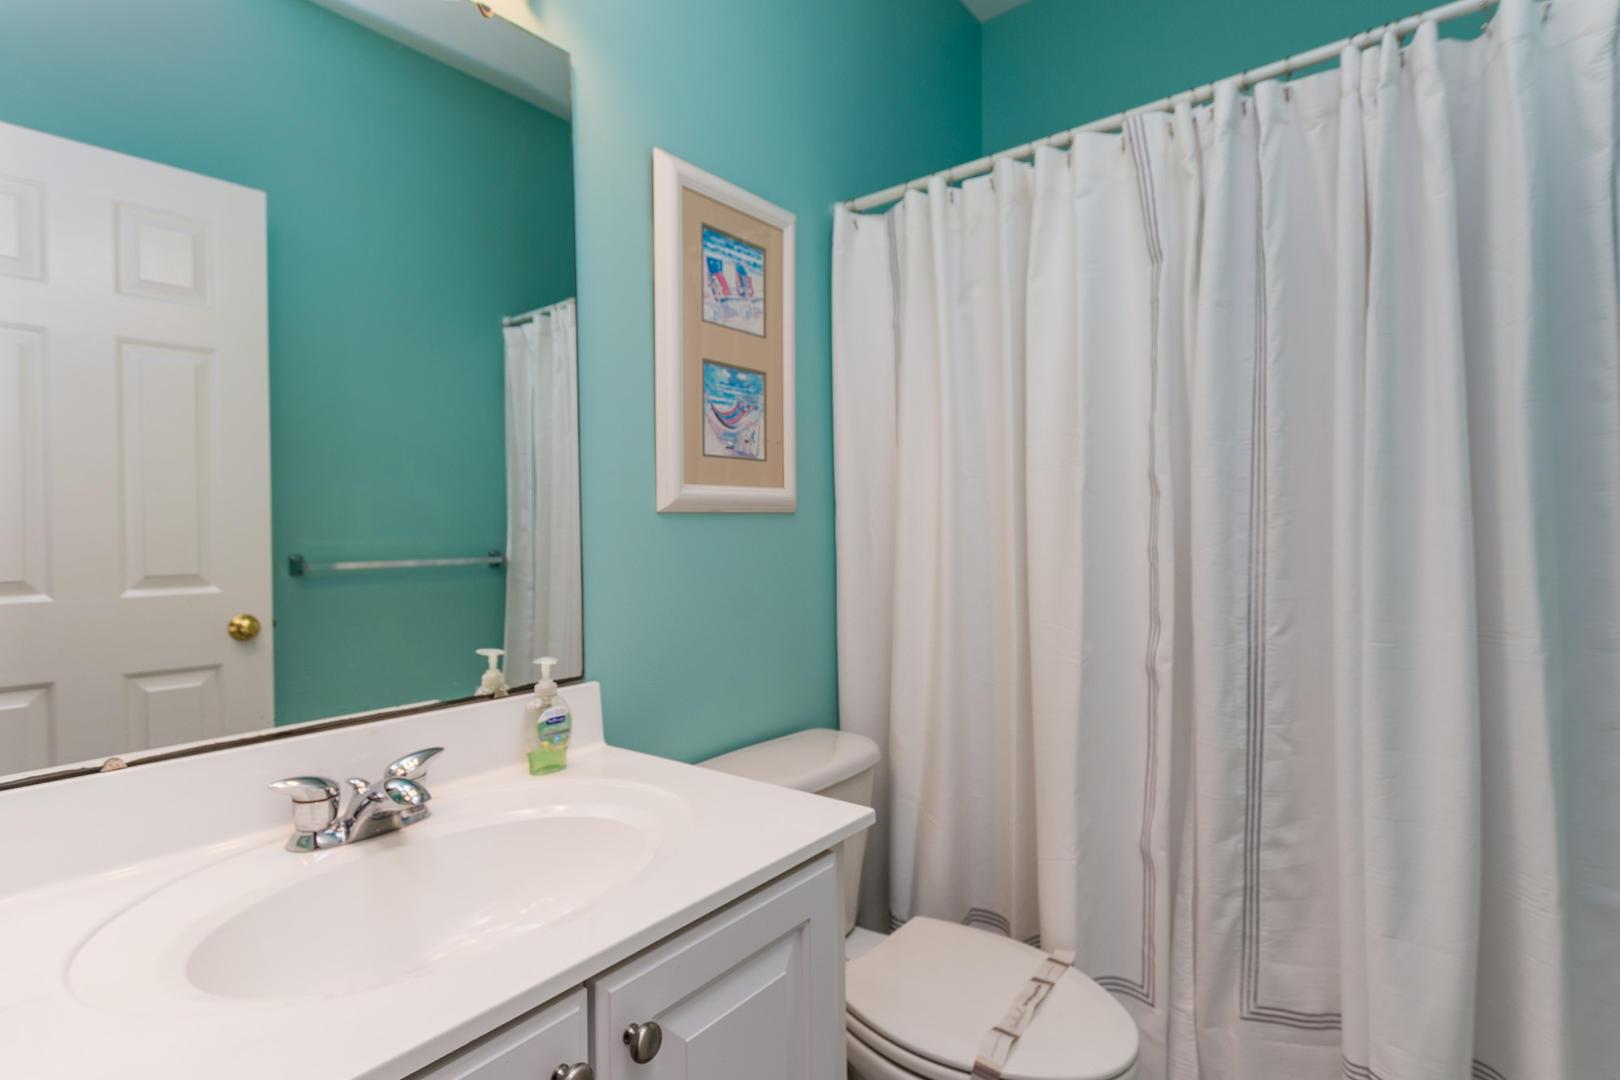 Sunset Island 43 Island Edge Dr. - Bathroom 2